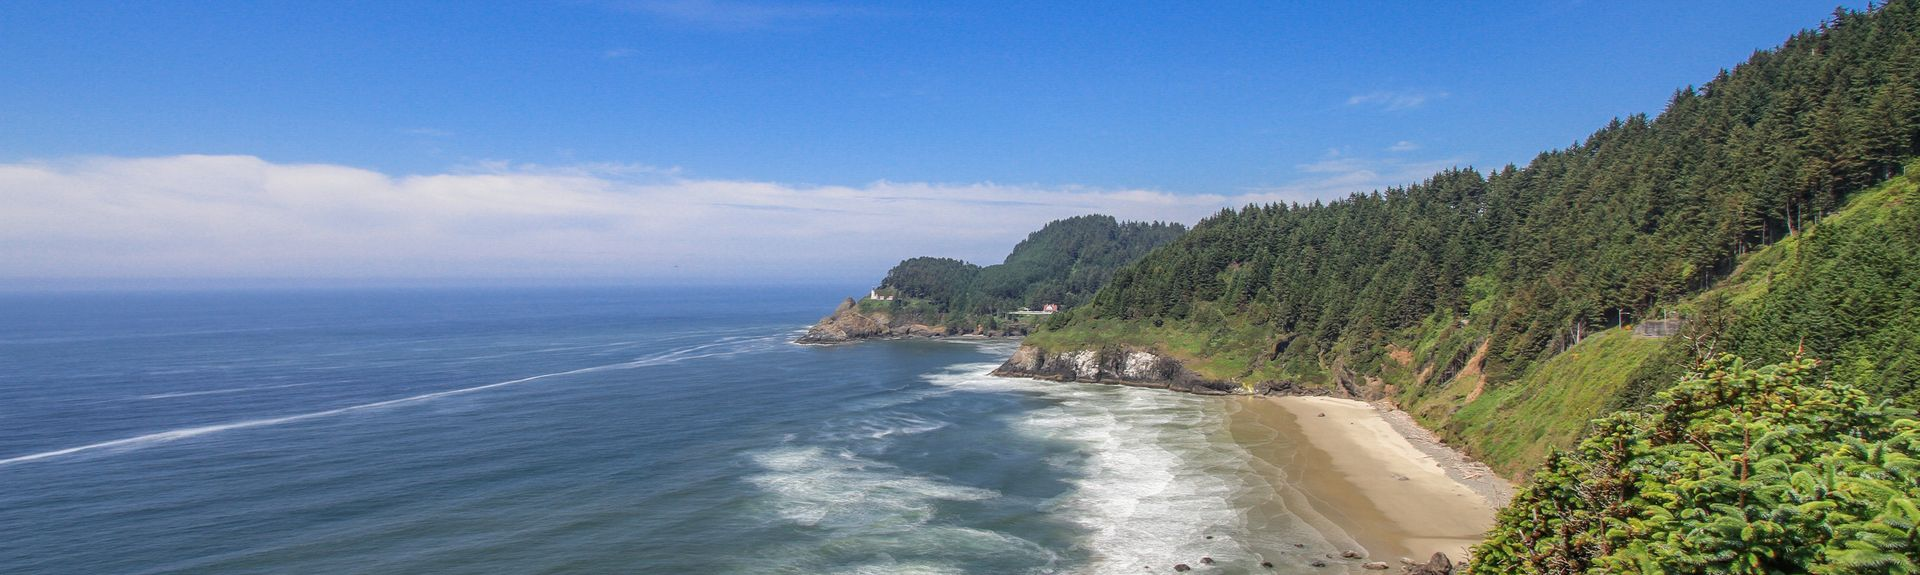 Douglas County, Oregon, United States of America